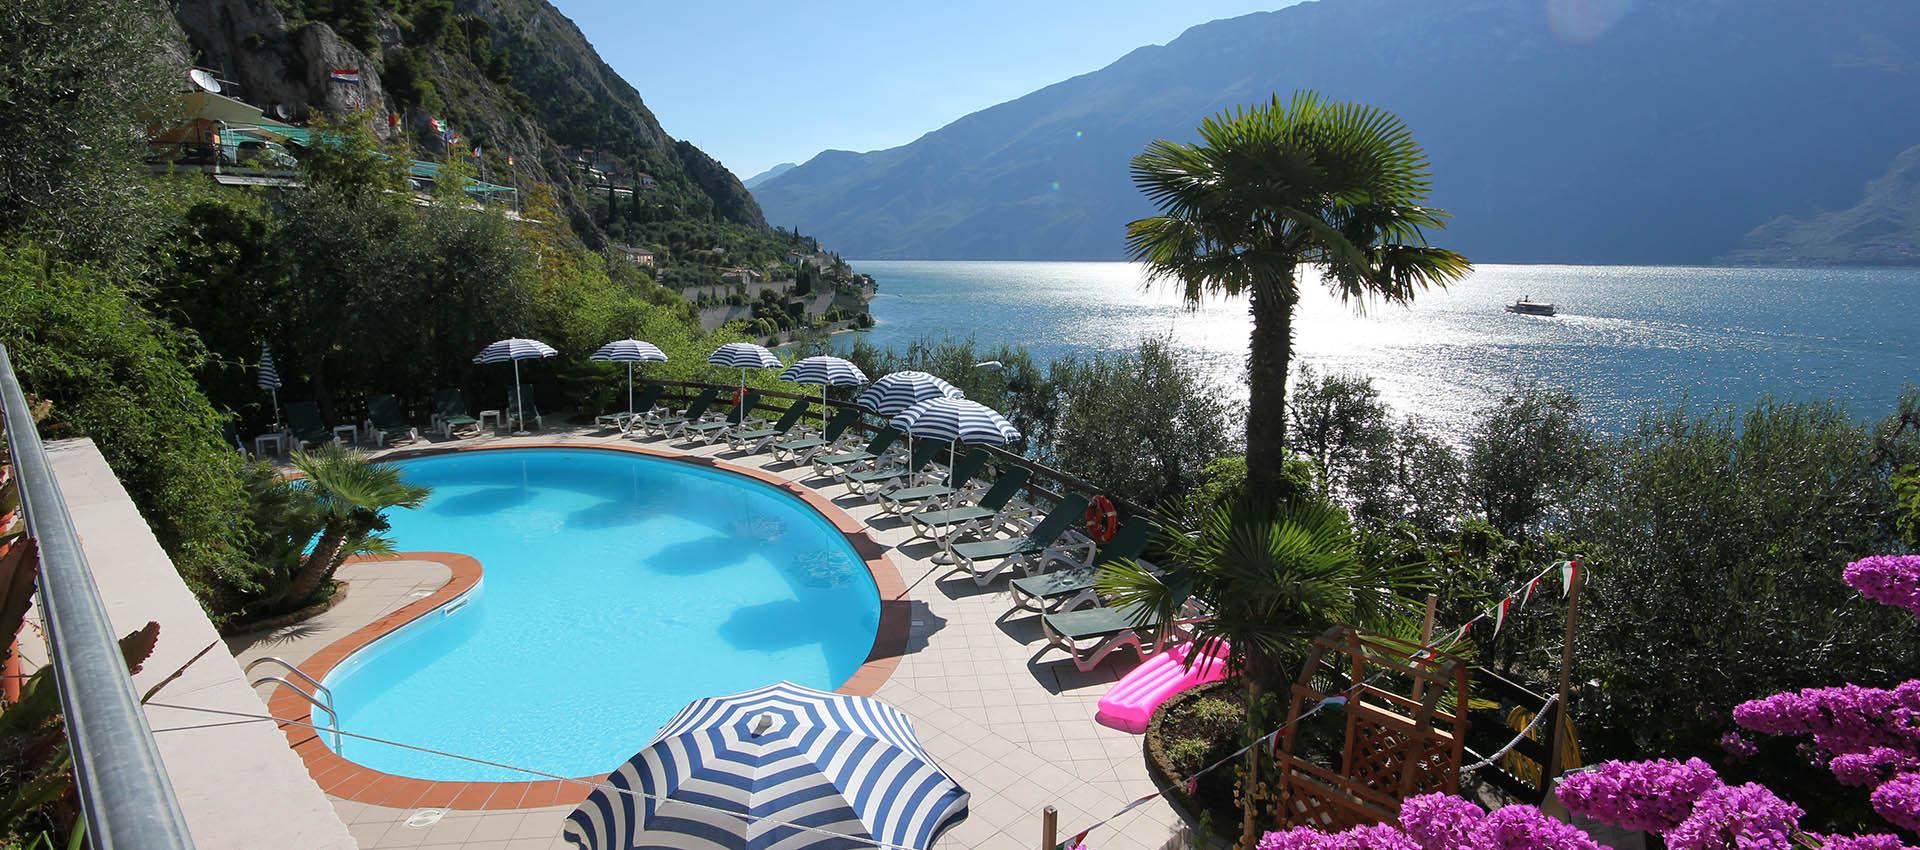 Hotel Garni Limone